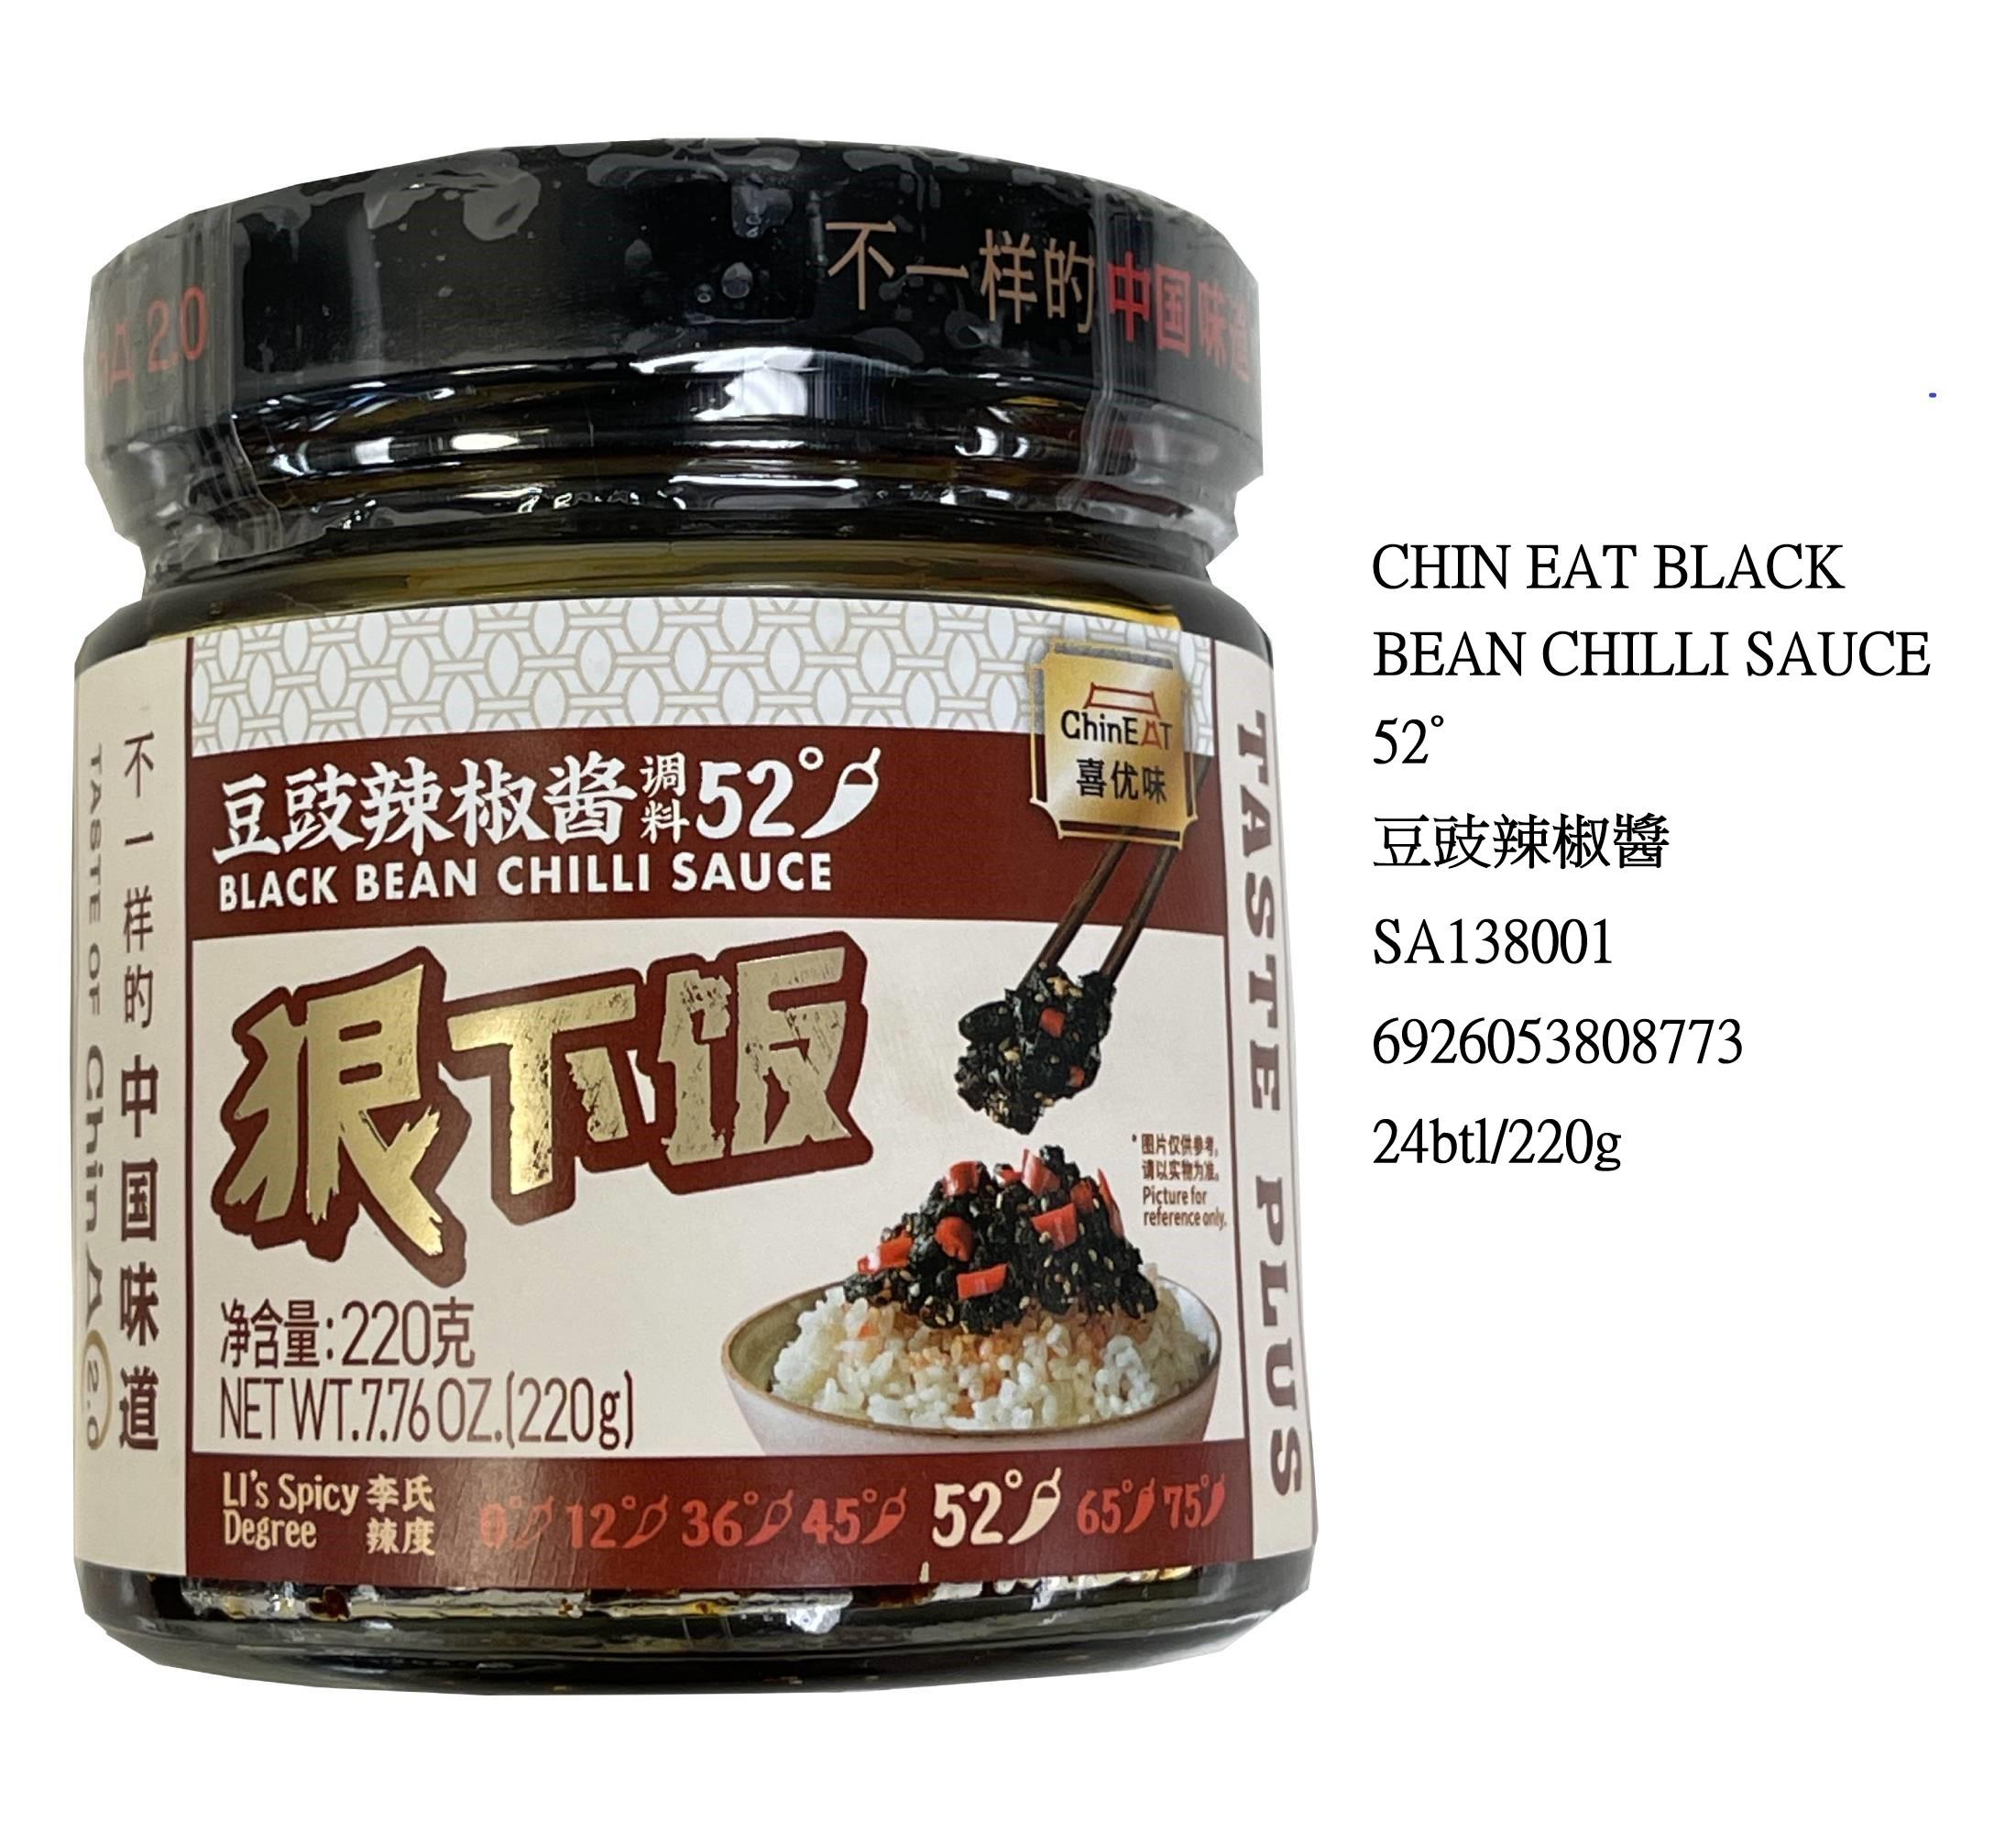 CHINEAT BLACK BEAN CHILLI SAUCE 52° SA138001